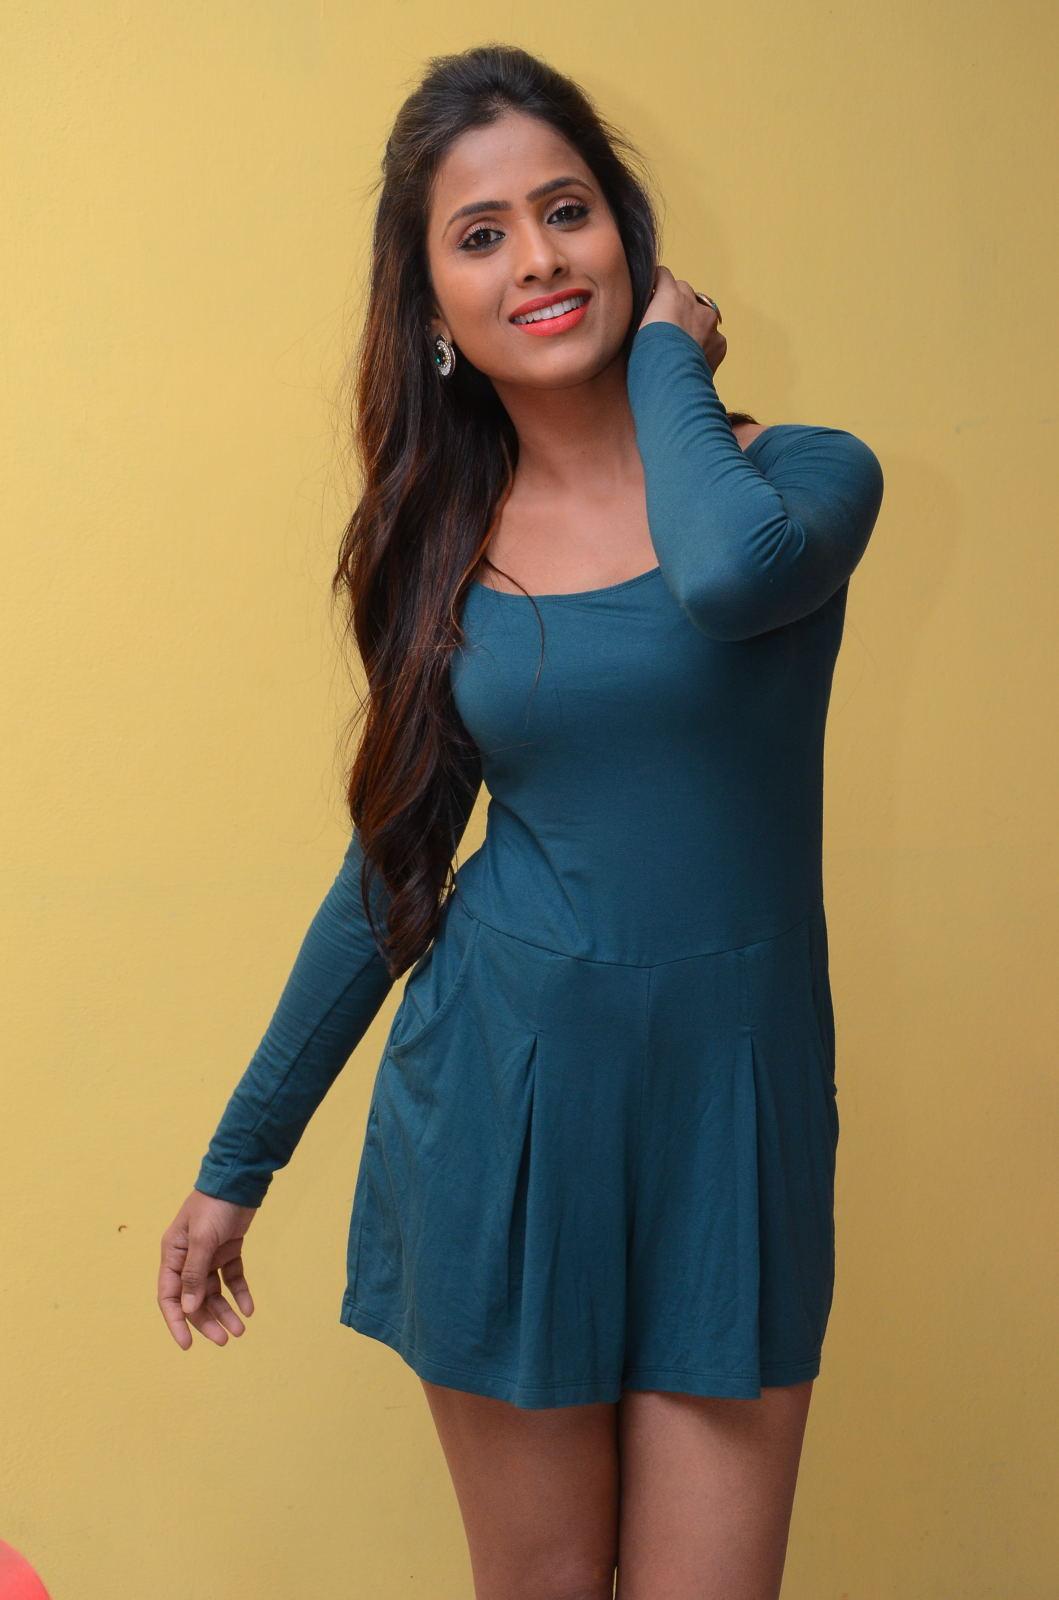 Super Hot Prashanthi In Sexy Outfit  Indian Cinema  Models  Actress-1037